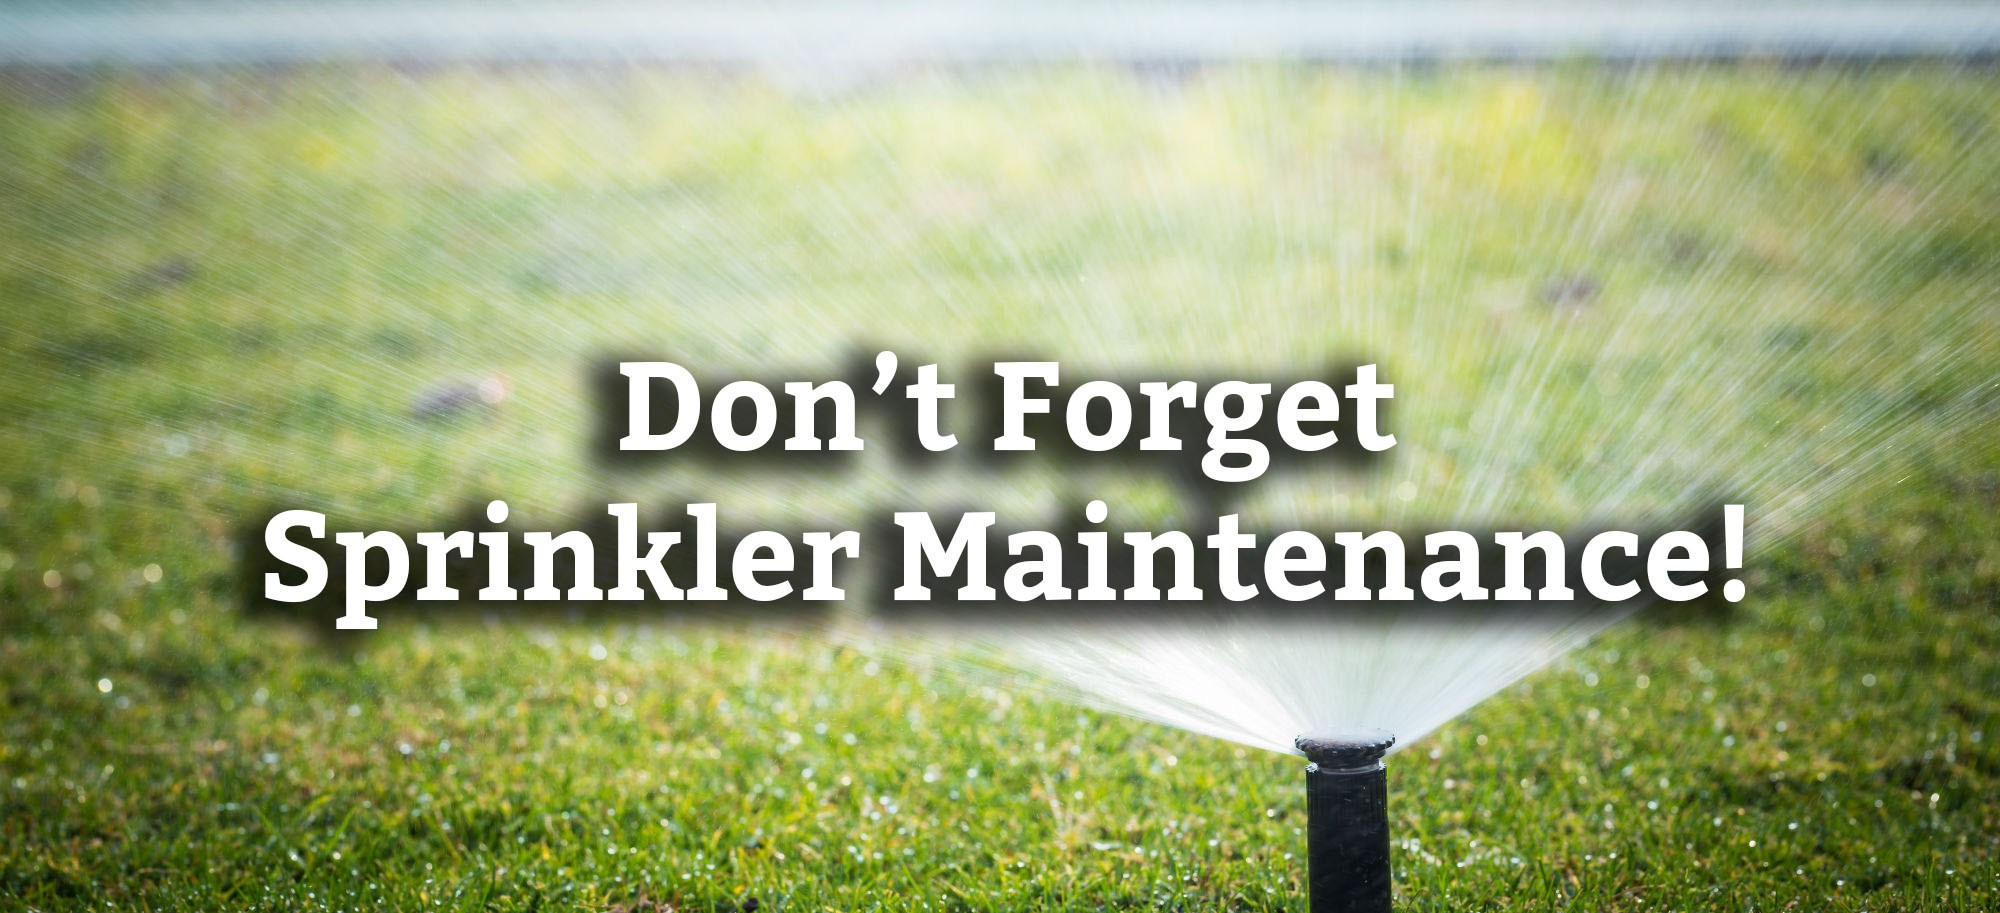 sprinkler-maintenance-company-Omaha-Nebraska